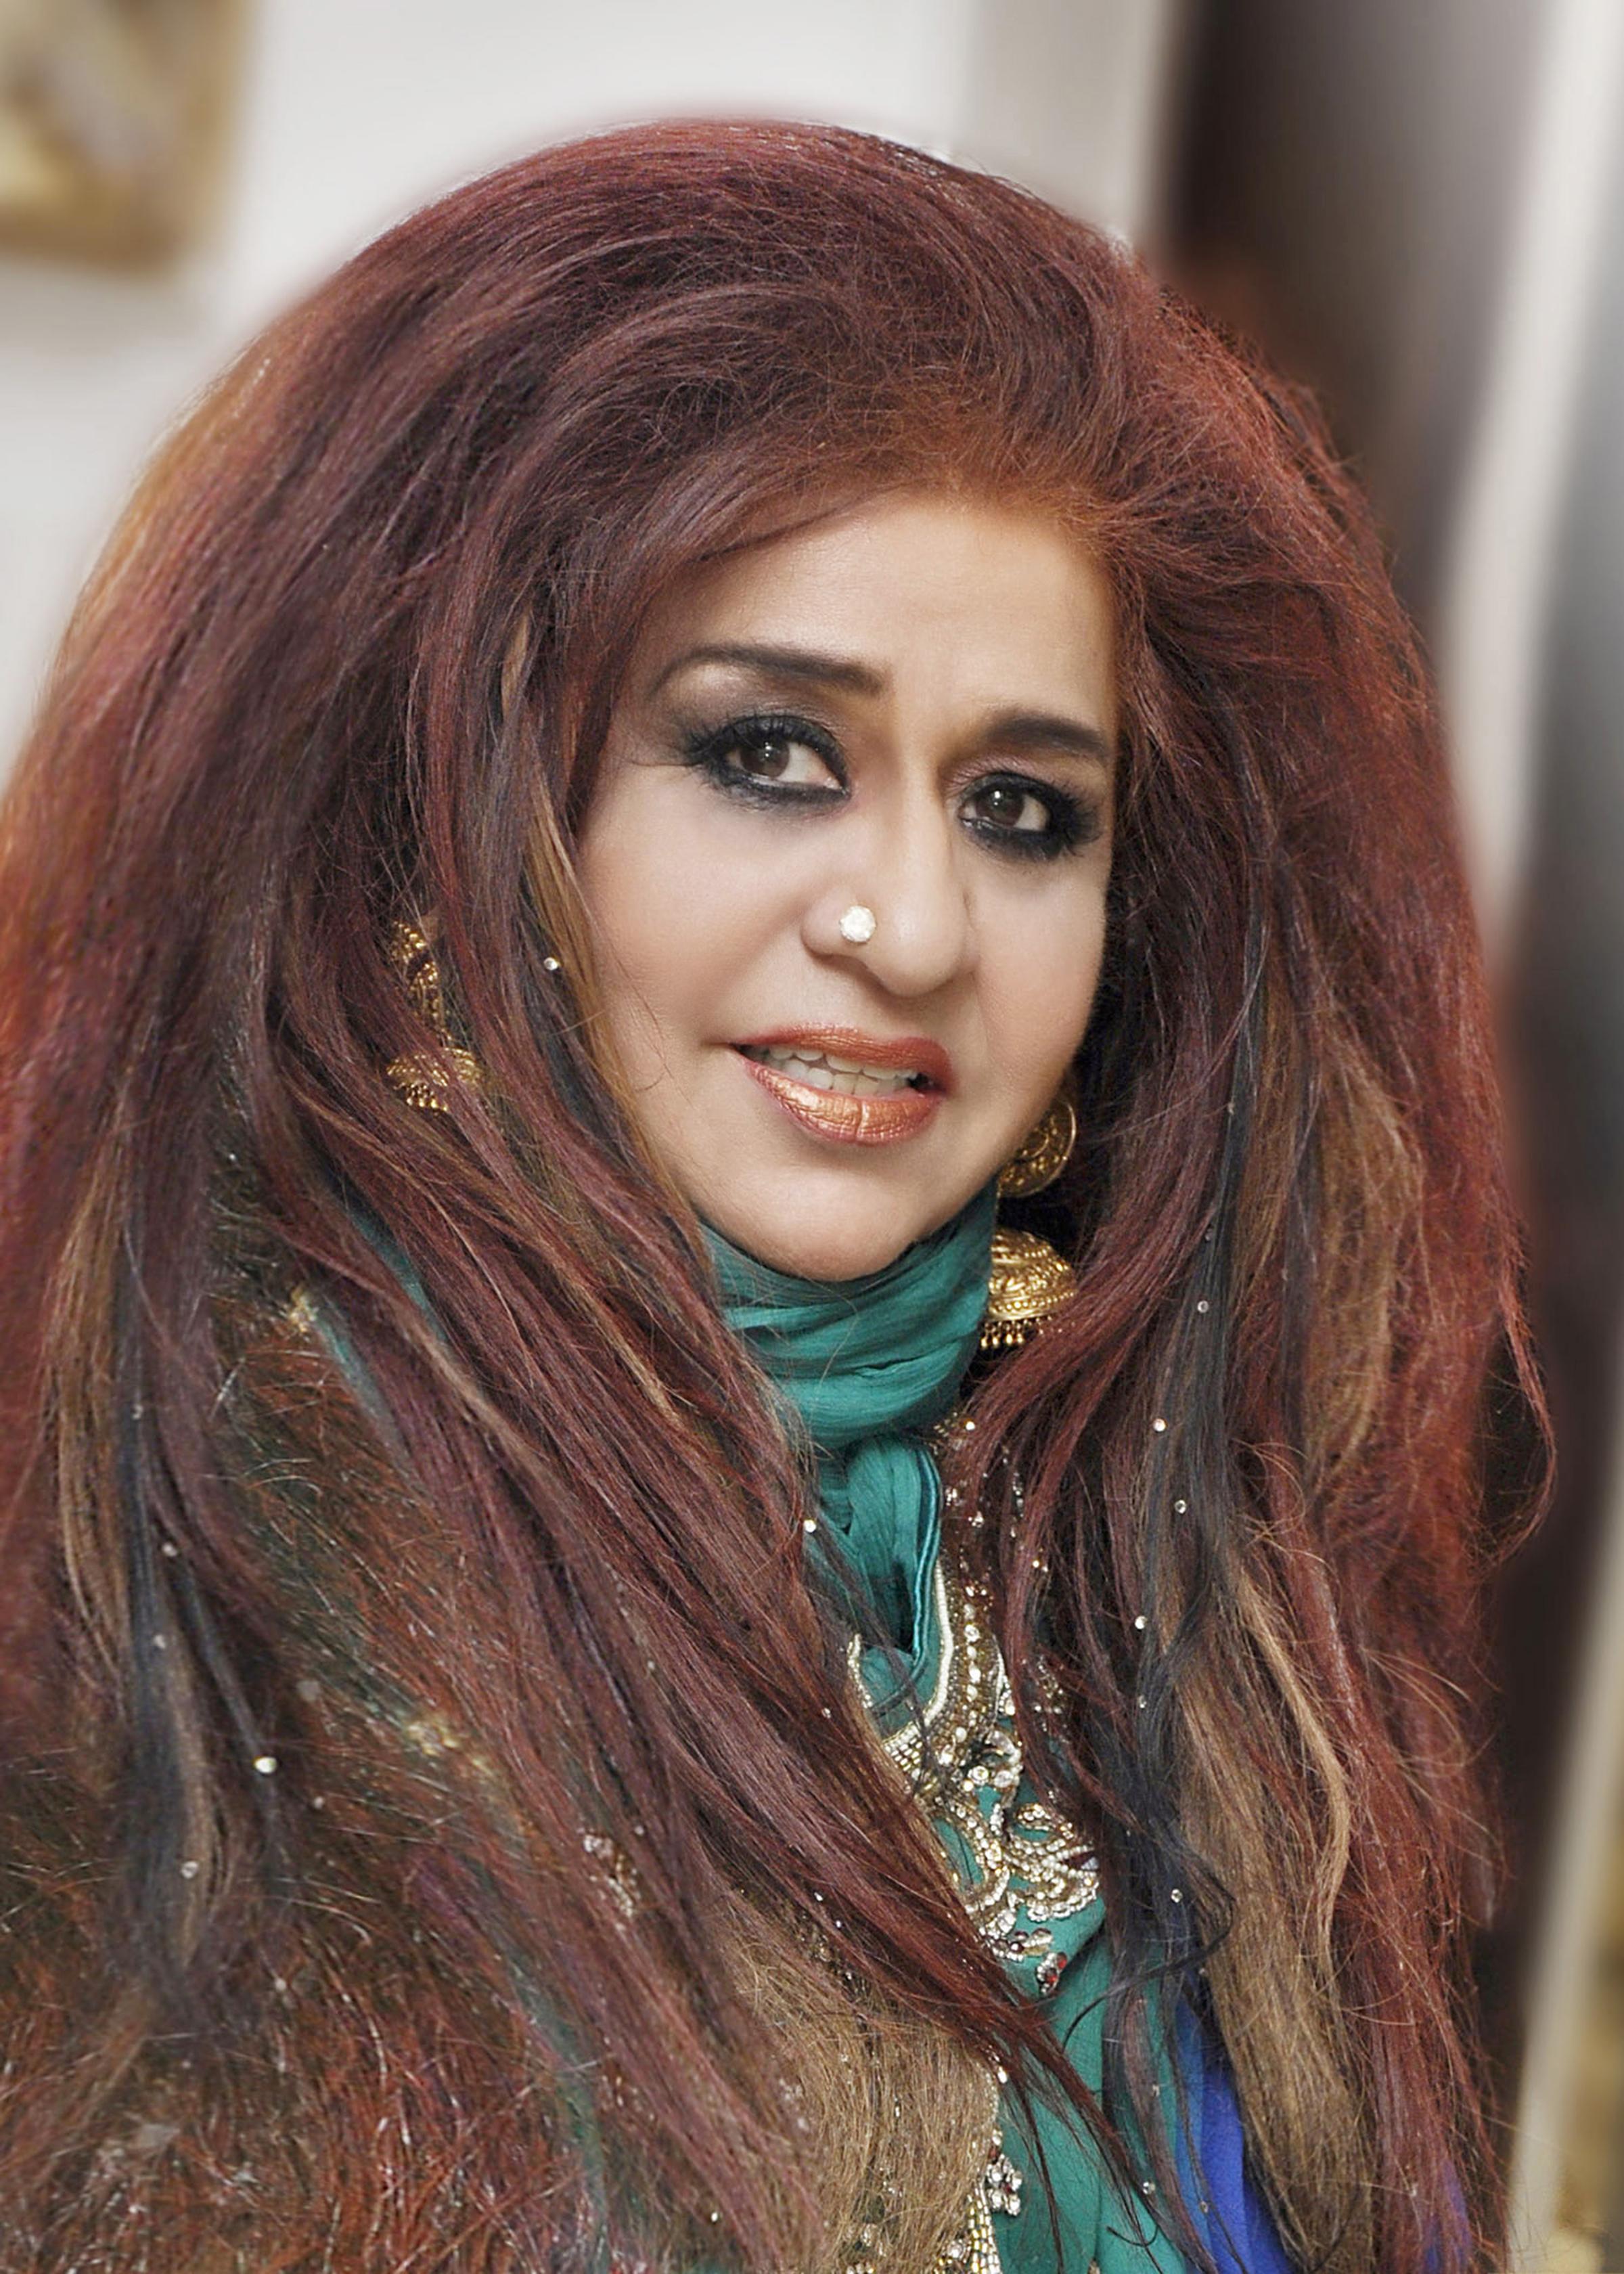 shahnaz hussain a successful indian woman entrepreneur